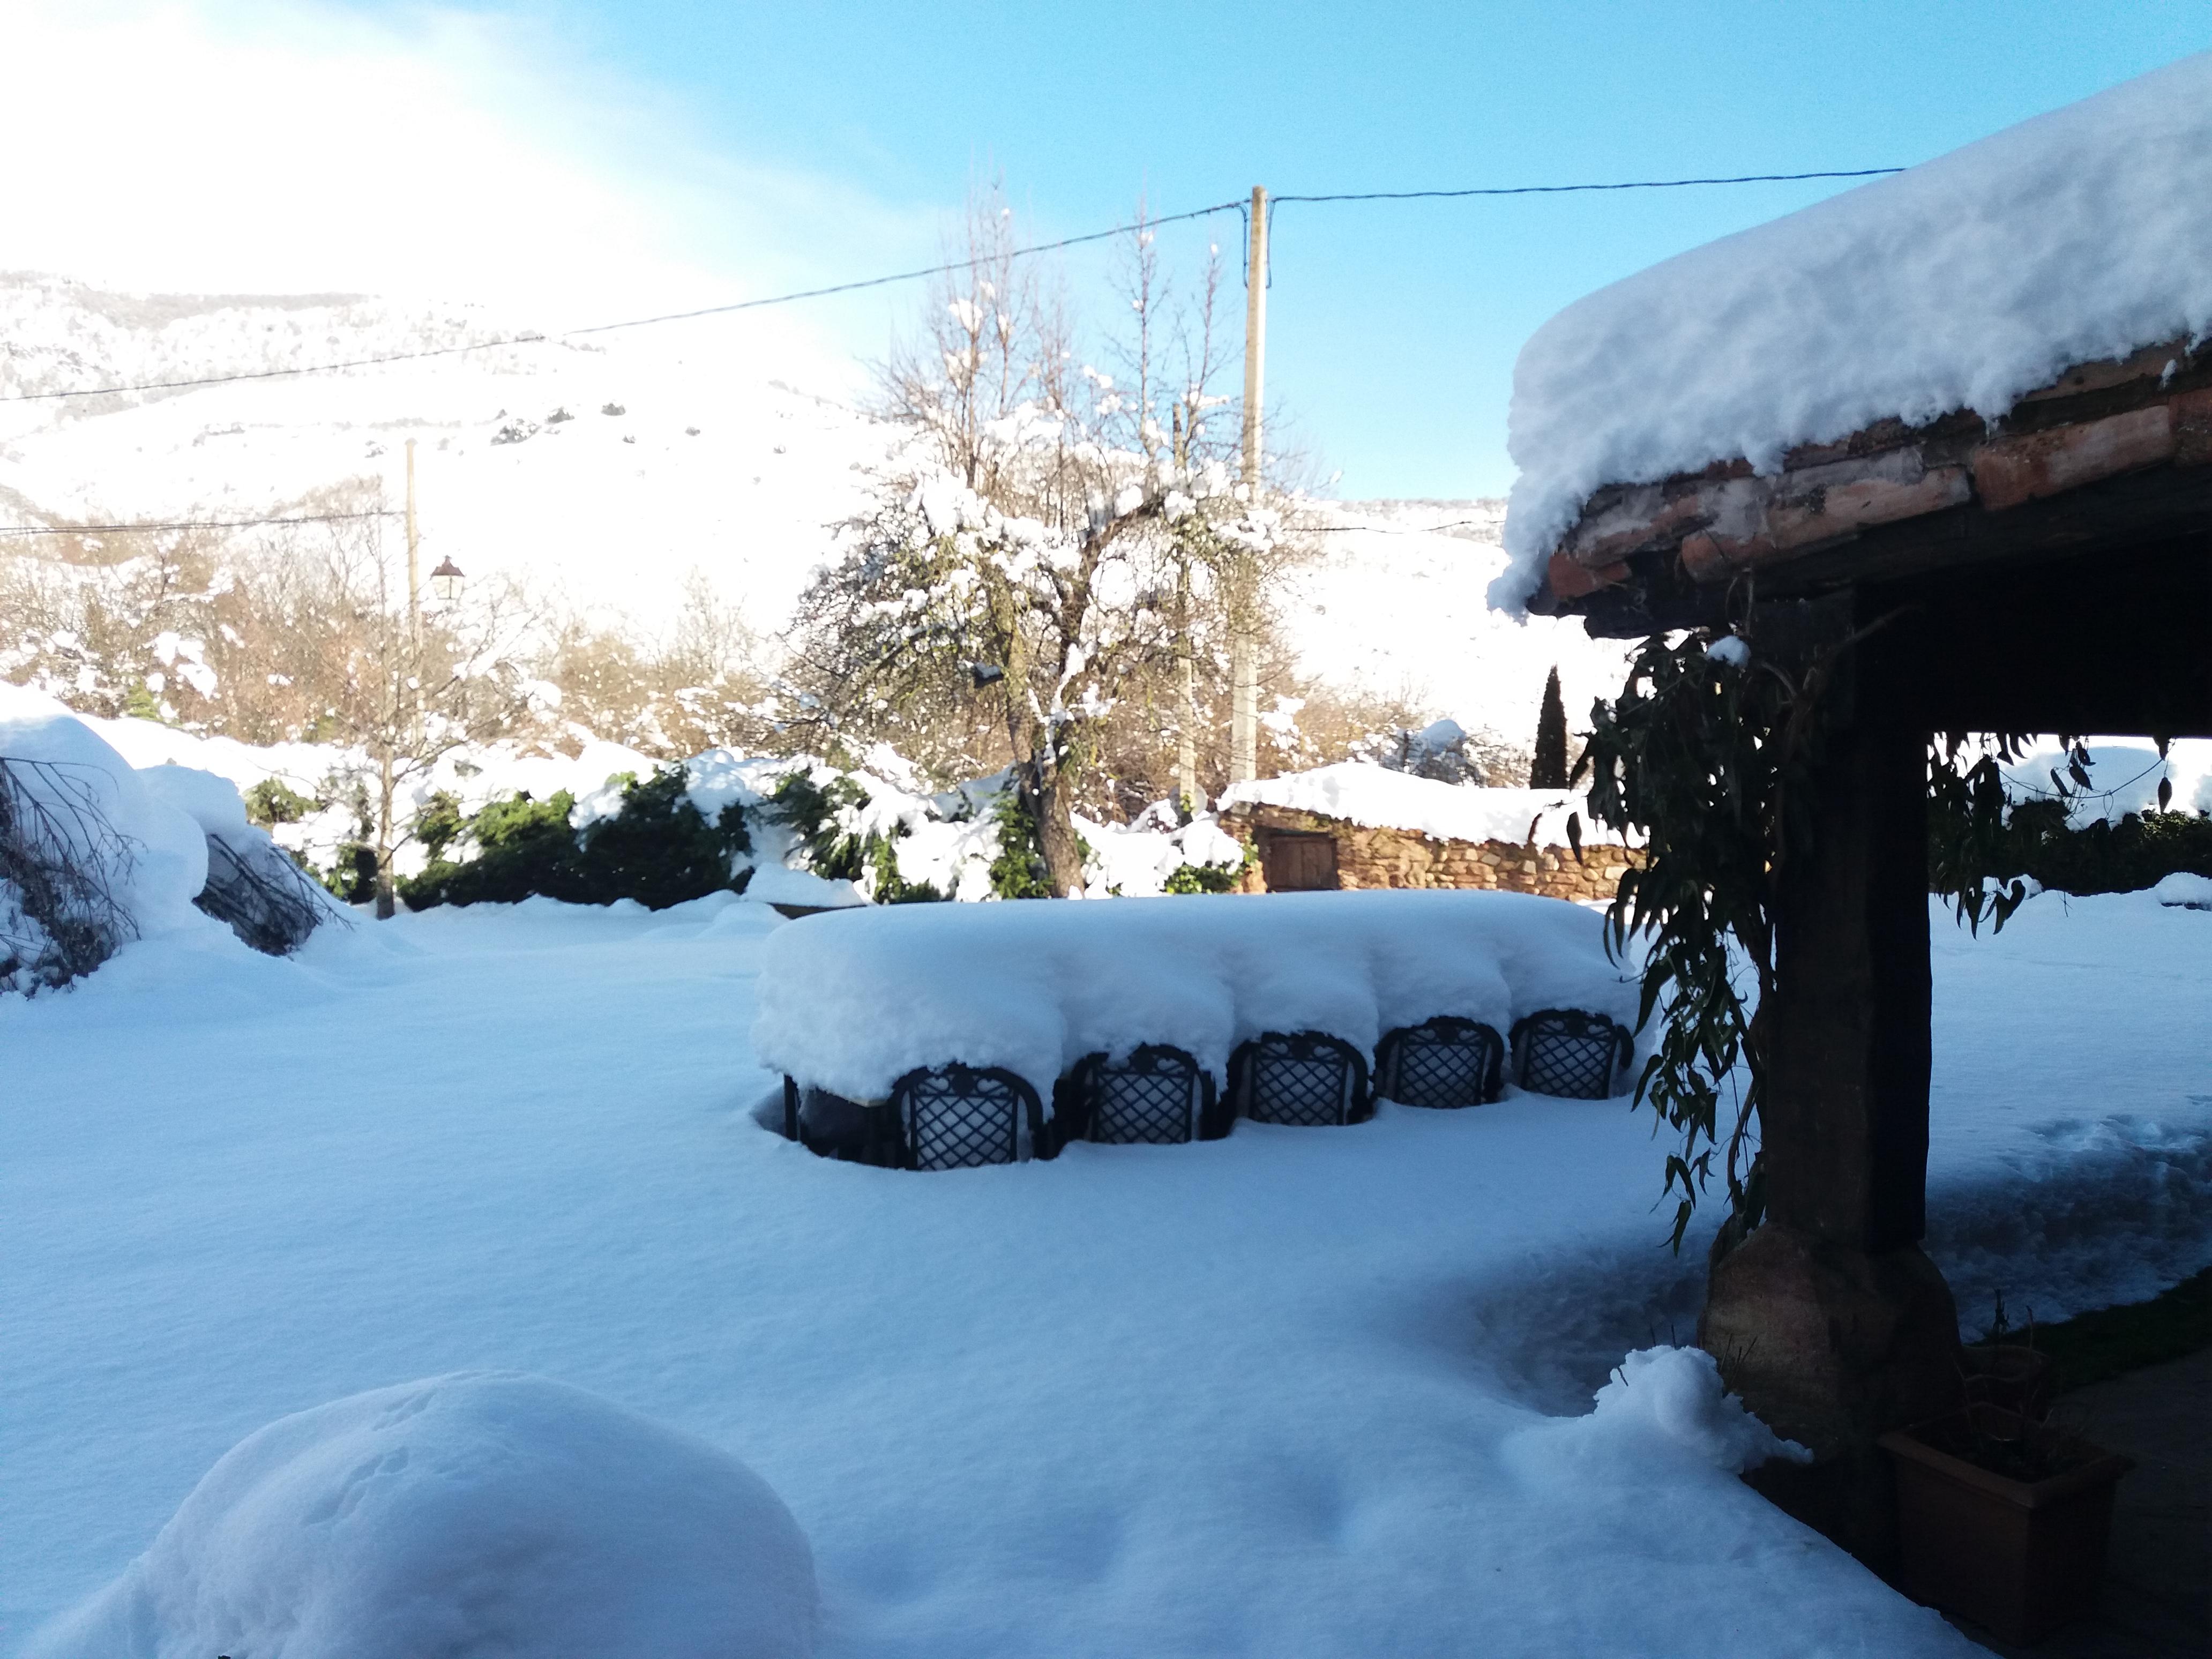 Mucha nieve para subir a esquiar en Valdezcaray…